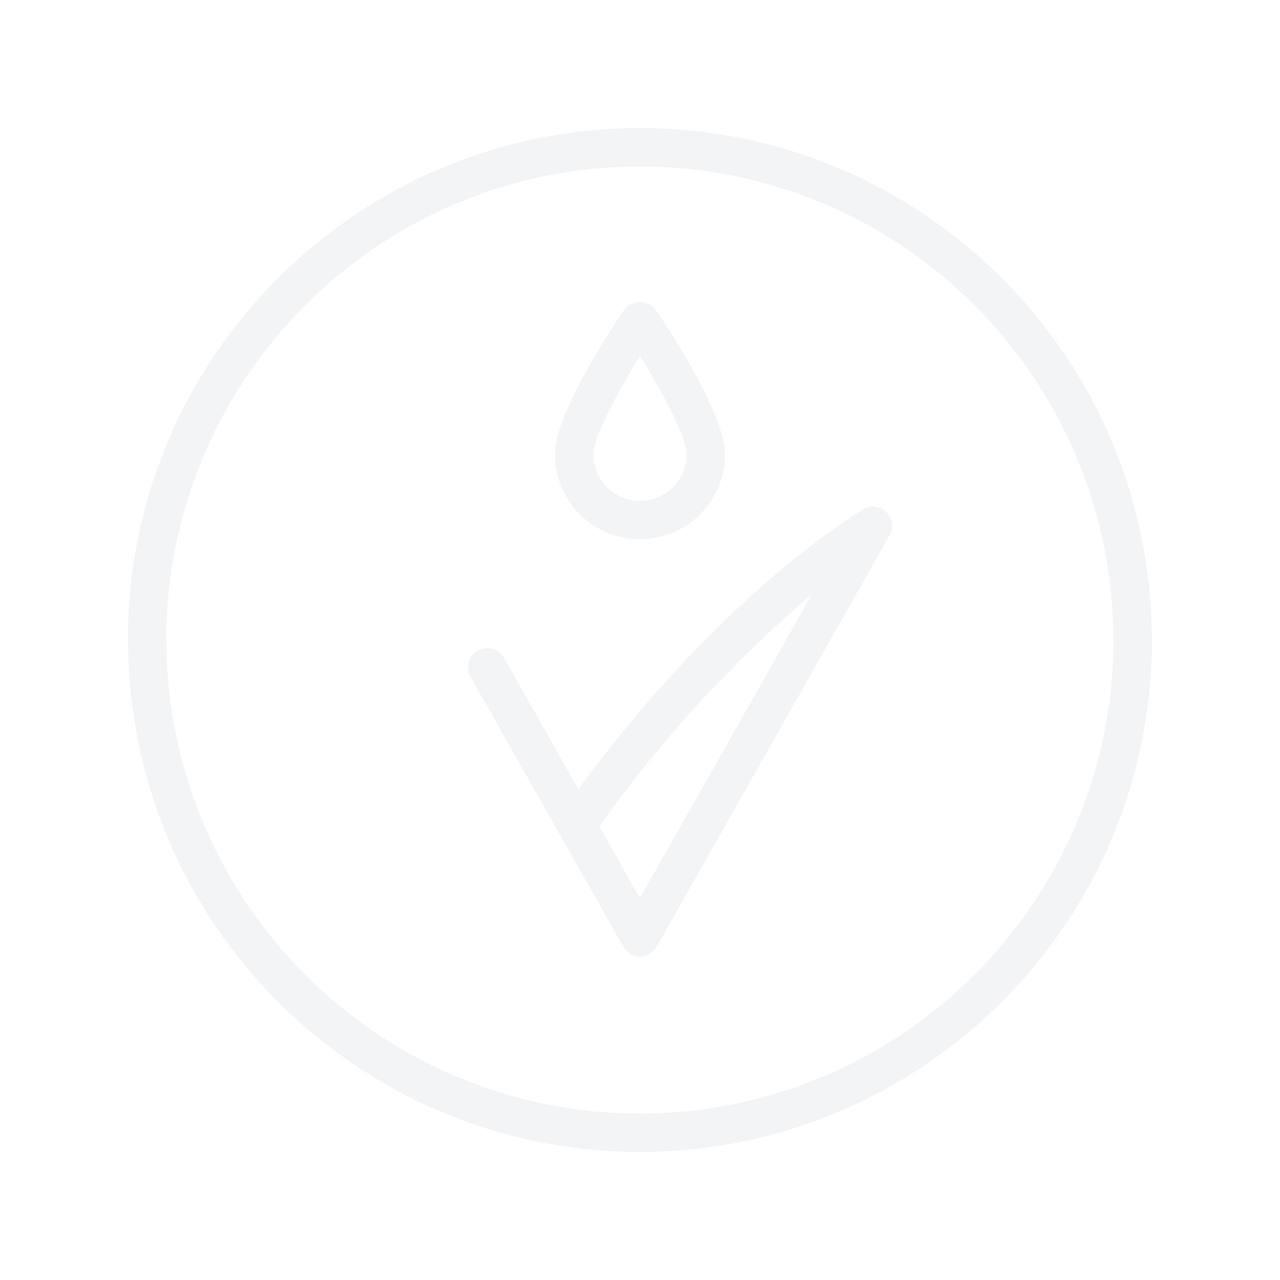 Shiseido Pureness Matifying Compact Oil-Free SPF 15 11g